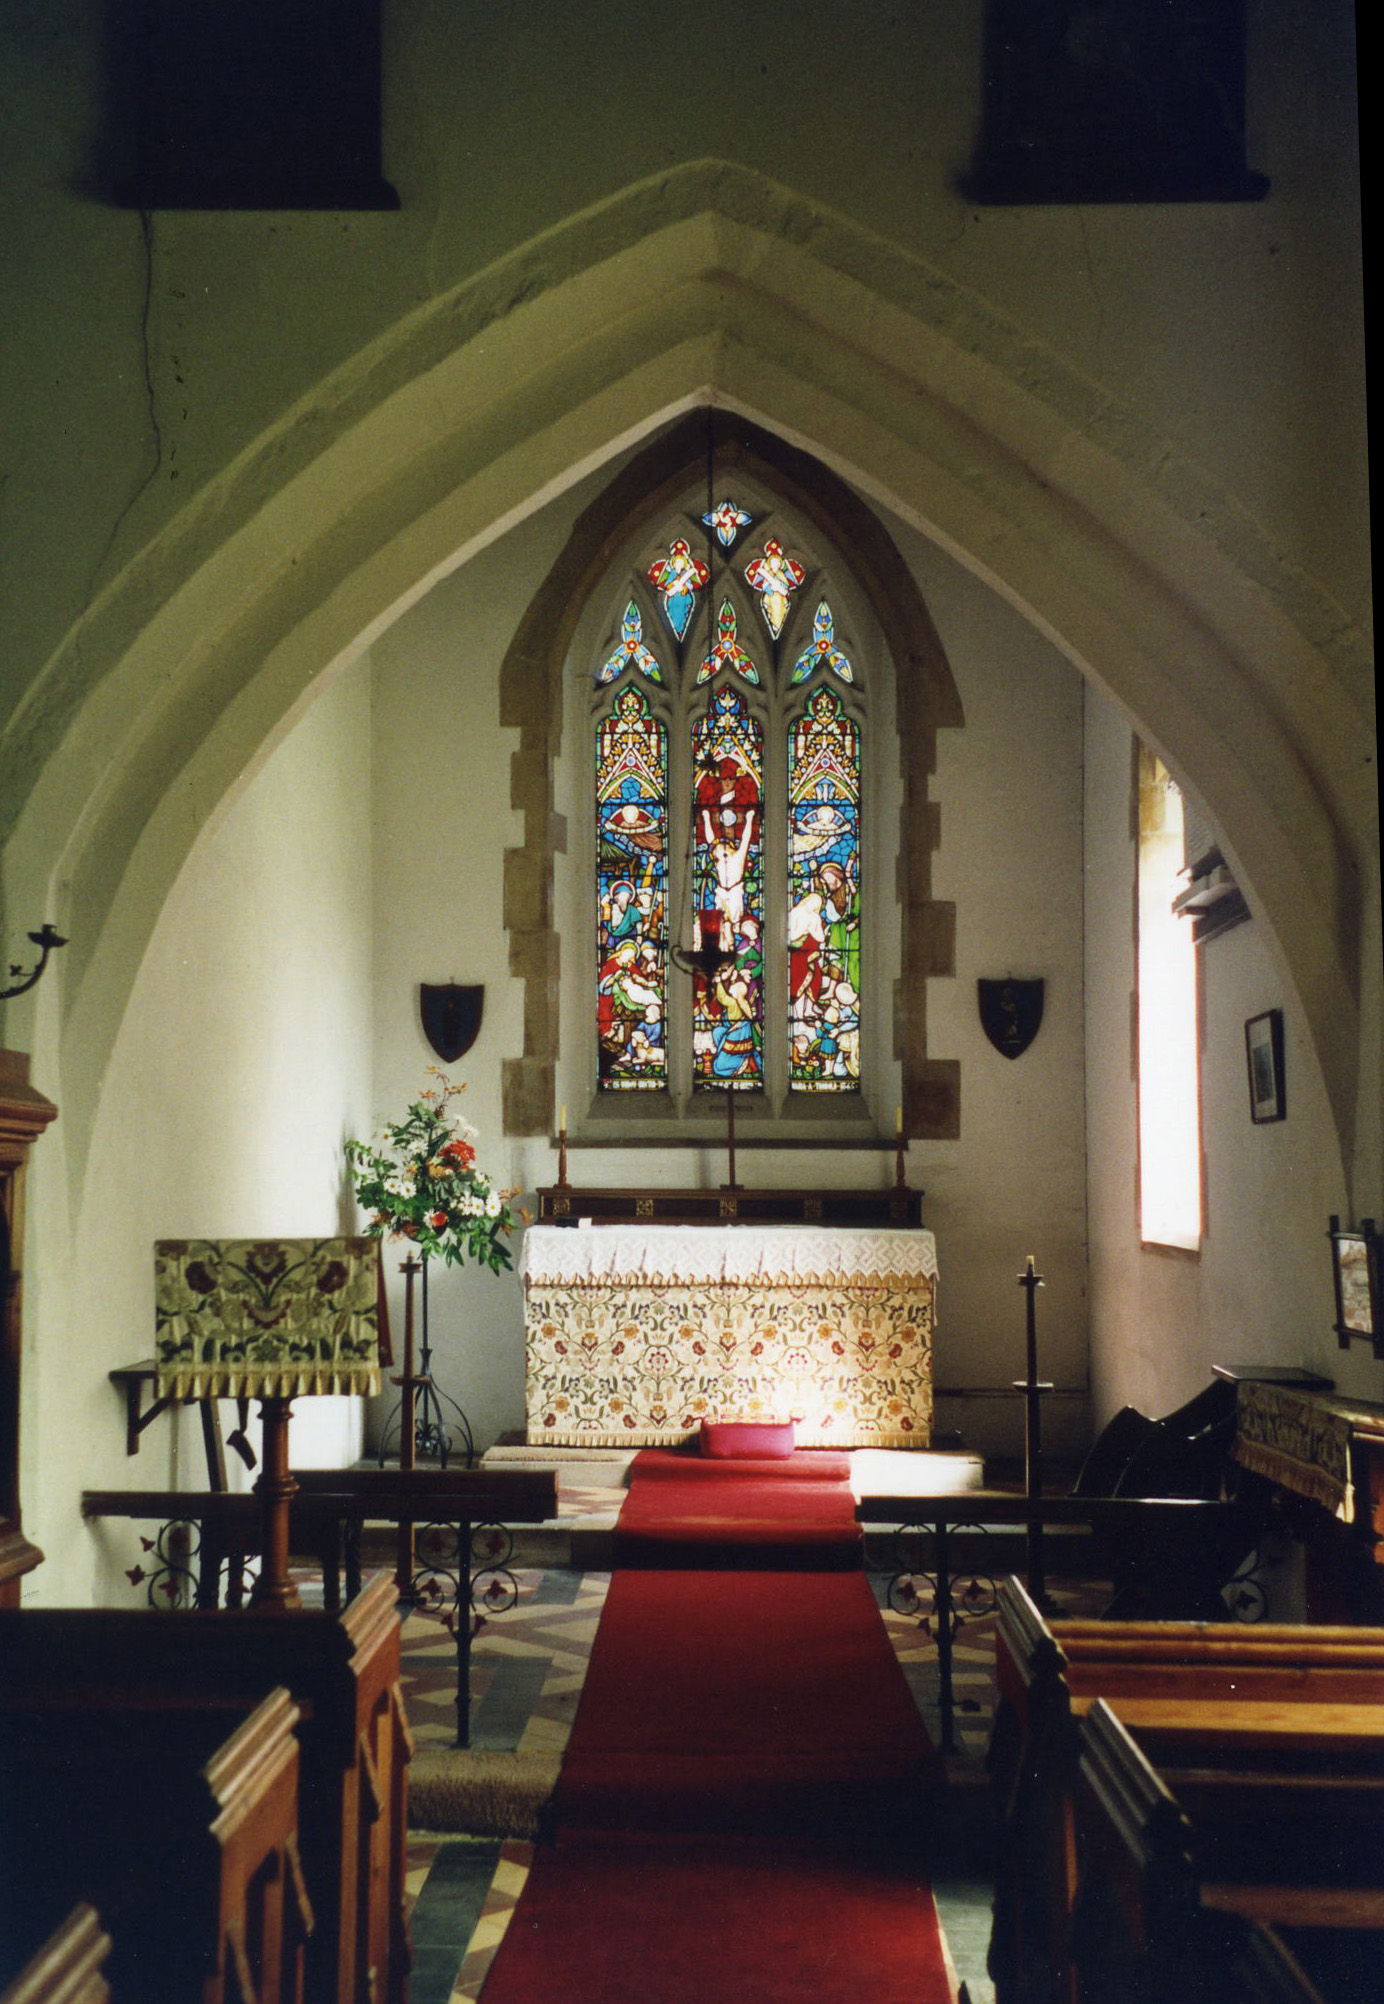 St. Nicholas church nave